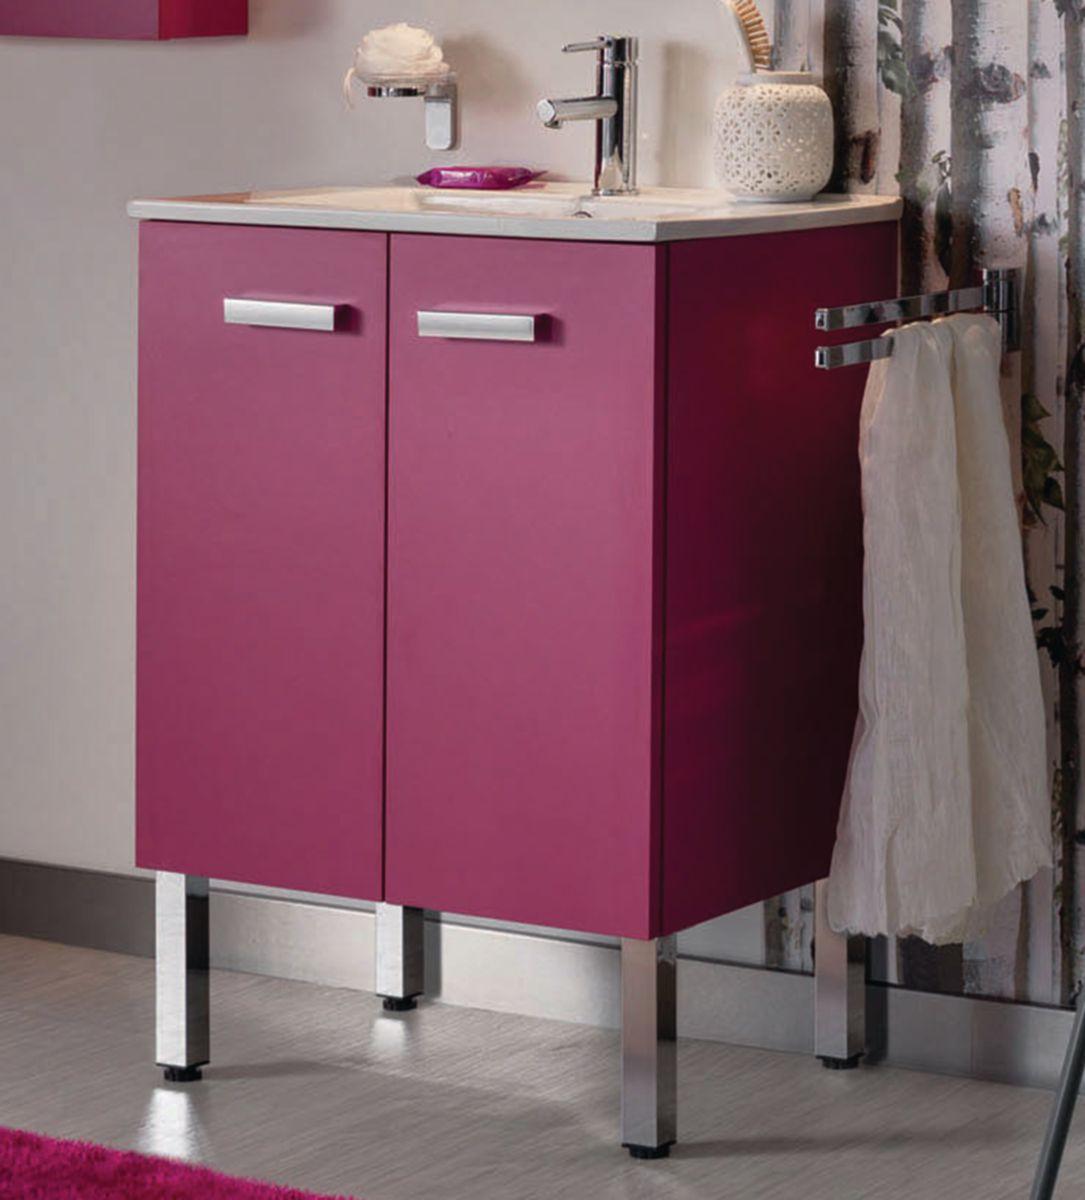 meuble salle de bain cedeo maison image id e. Black Bedroom Furniture Sets. Home Design Ideas